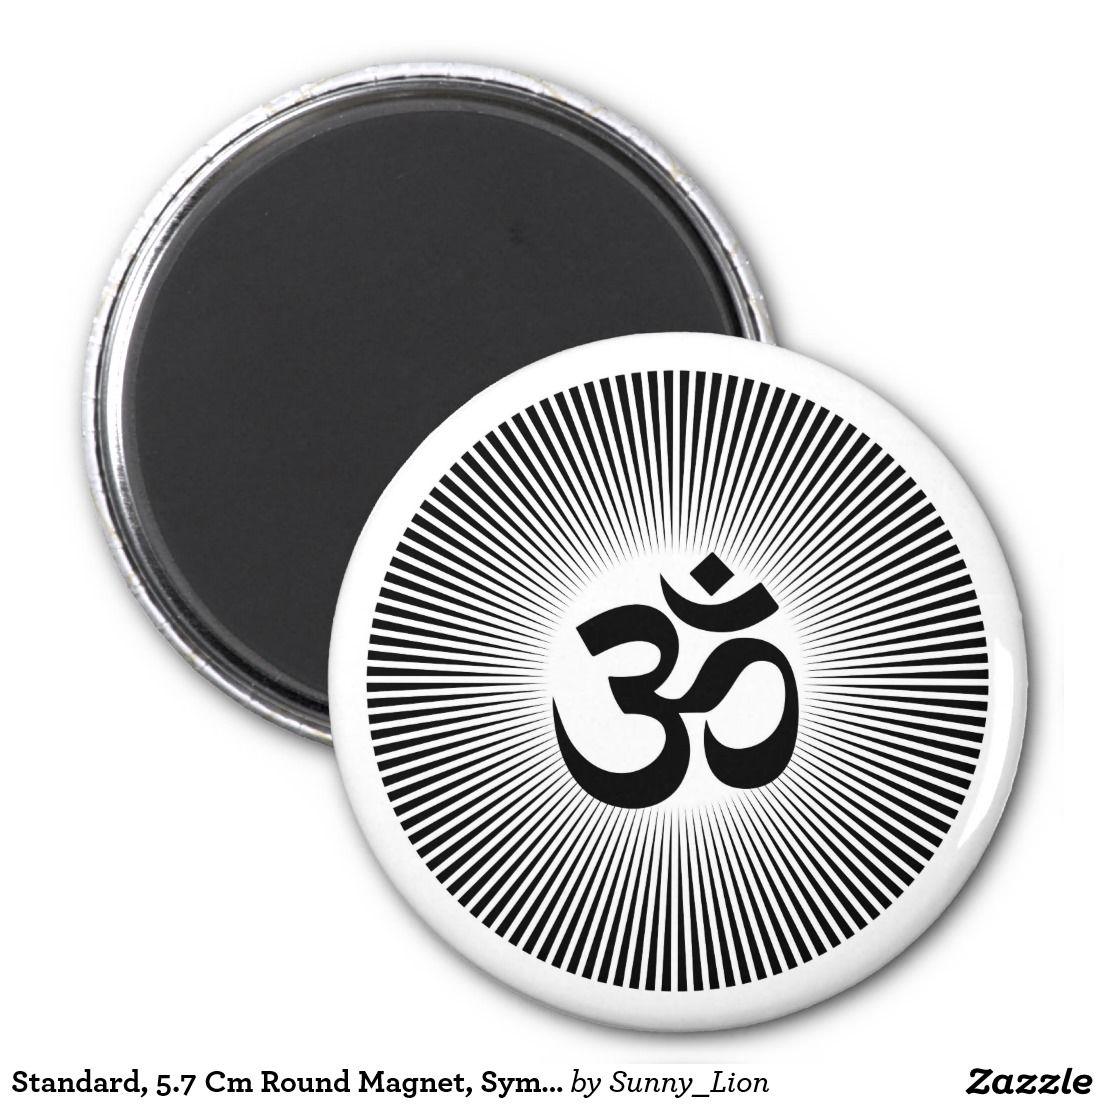 Atemberaubend Magnetsymbol Ideen - Verdrahtungsideen - korsmi.info